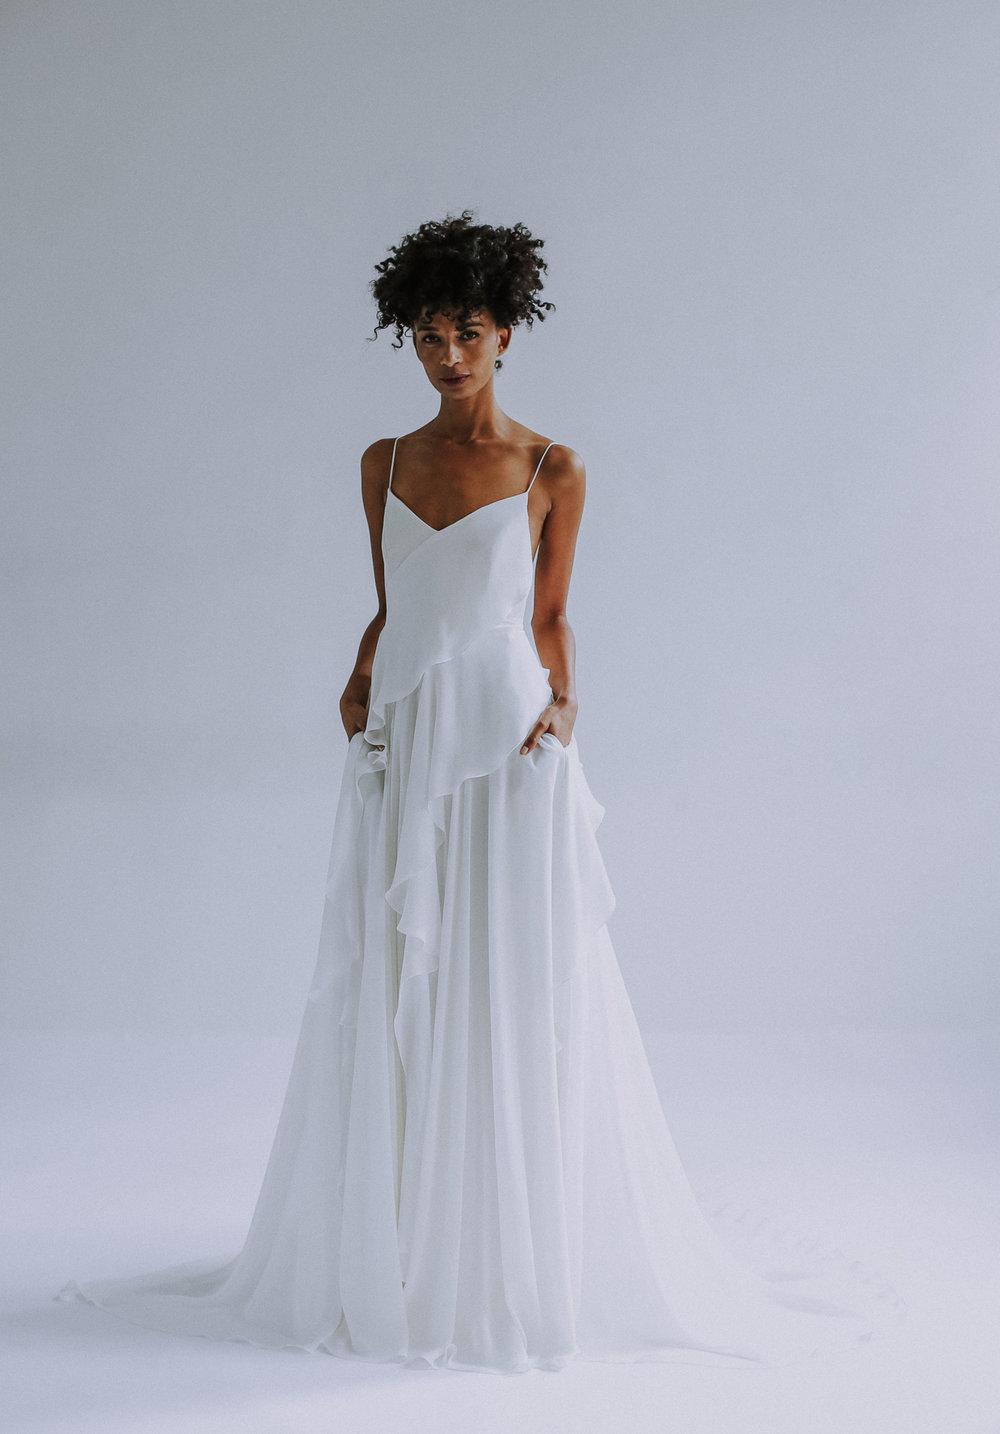 leanne-marshall-wedding-gown-2.jpg